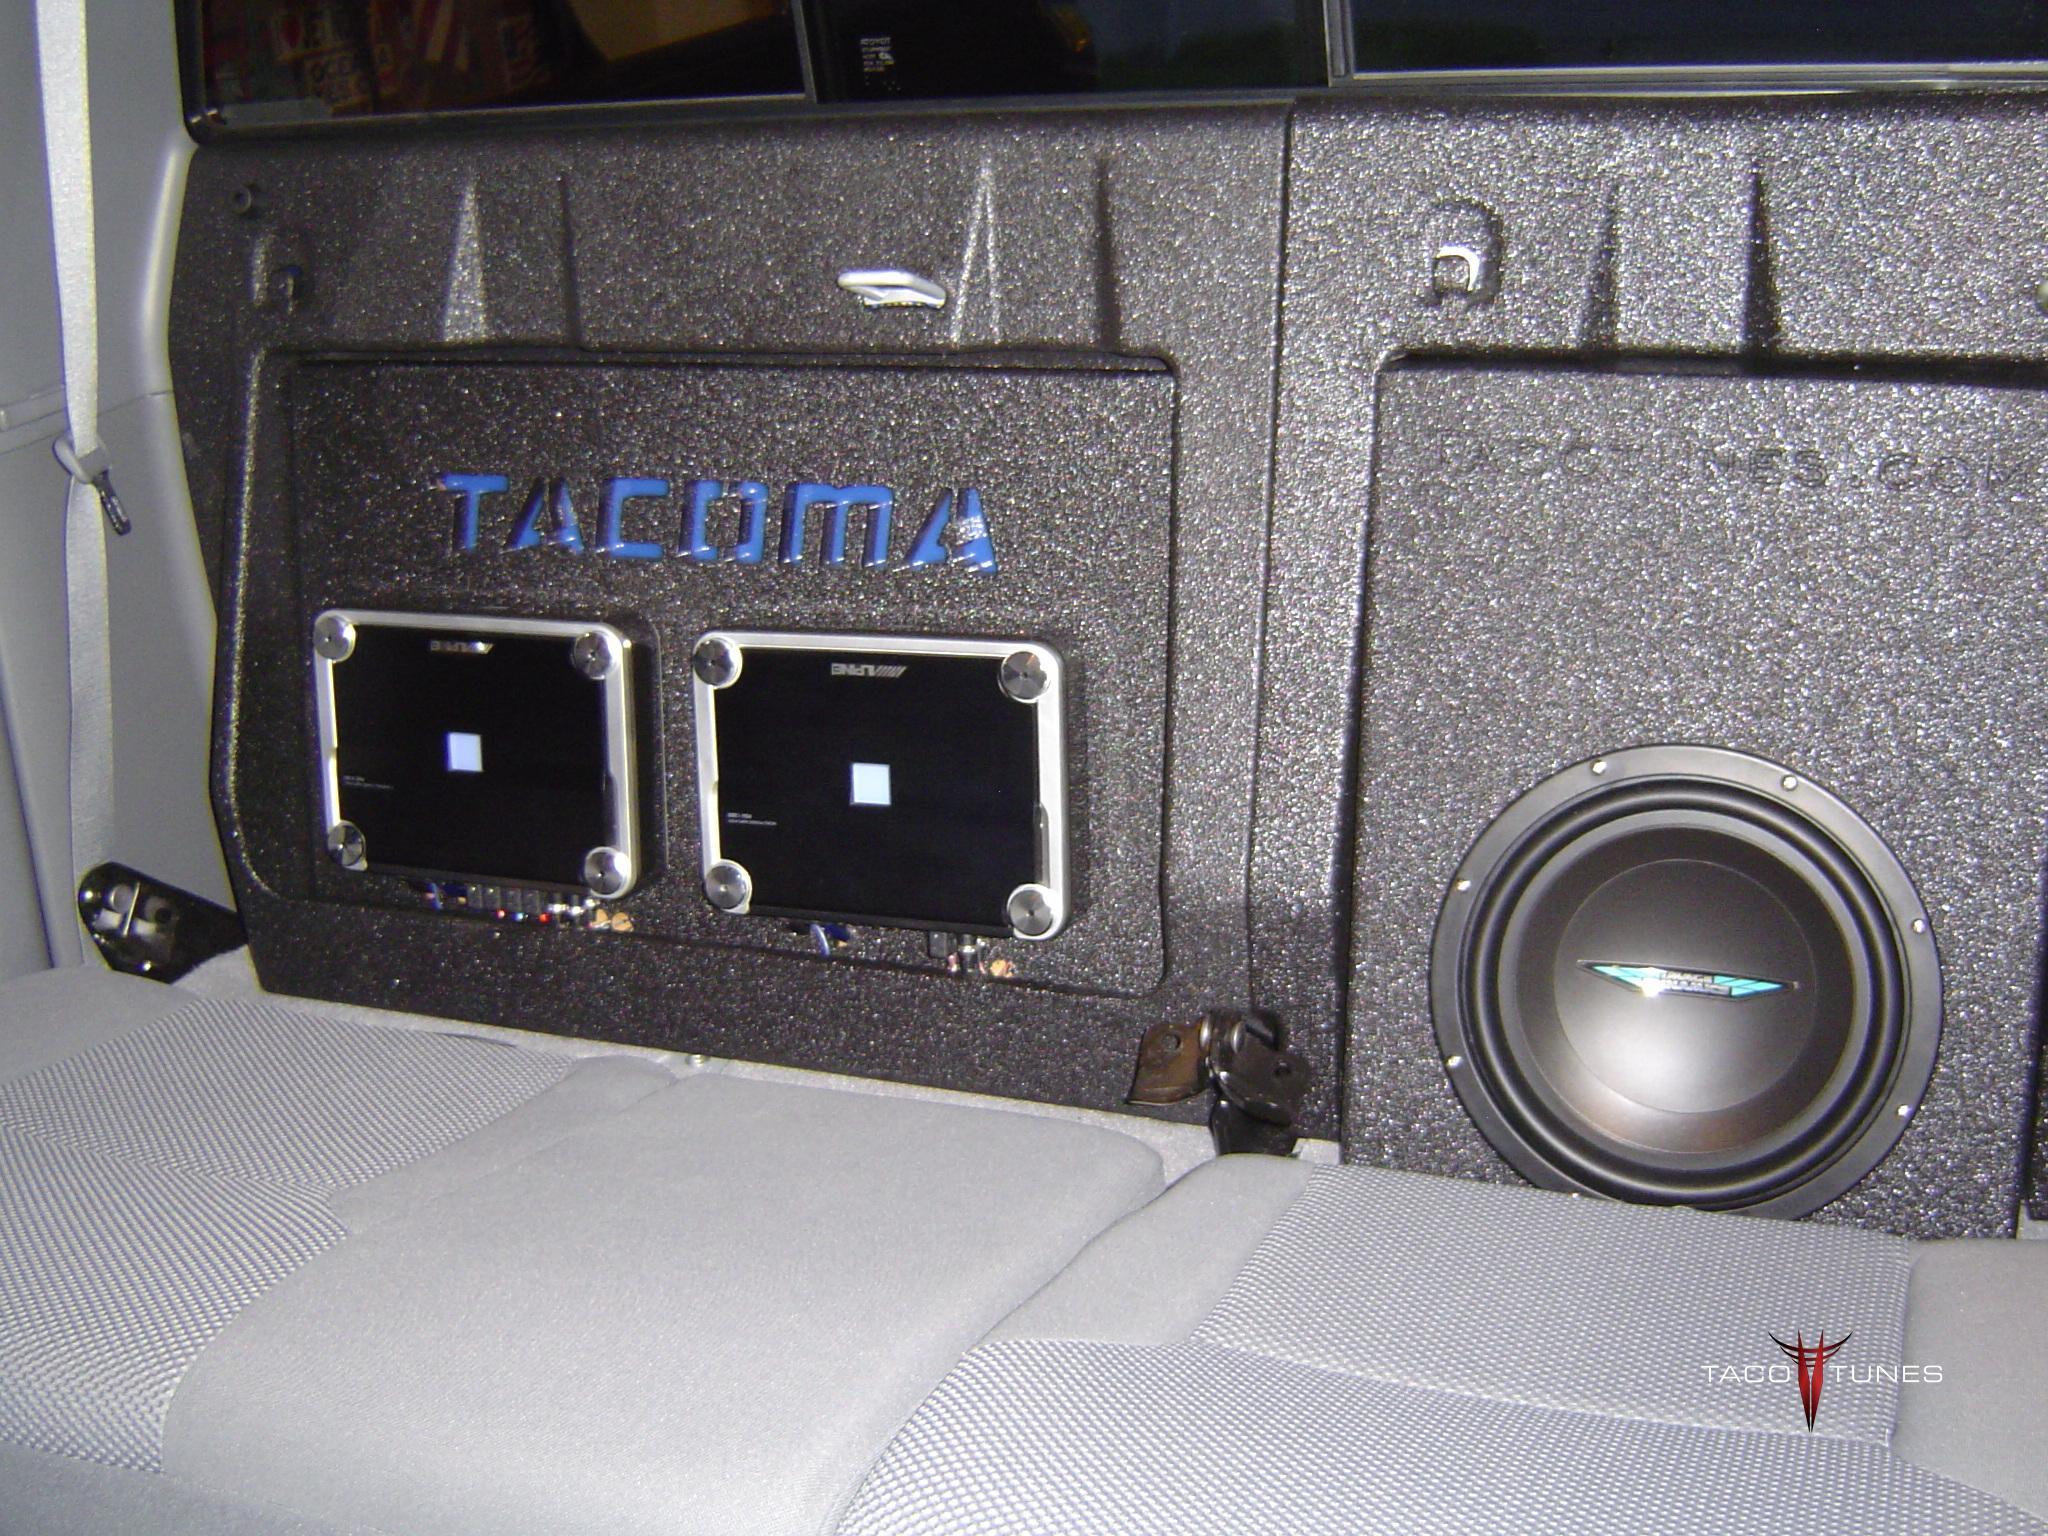 amp mounting board w tacoma cutout taco tunes toyota. Black Bedroom Furniture Sets. Home Design Ideas